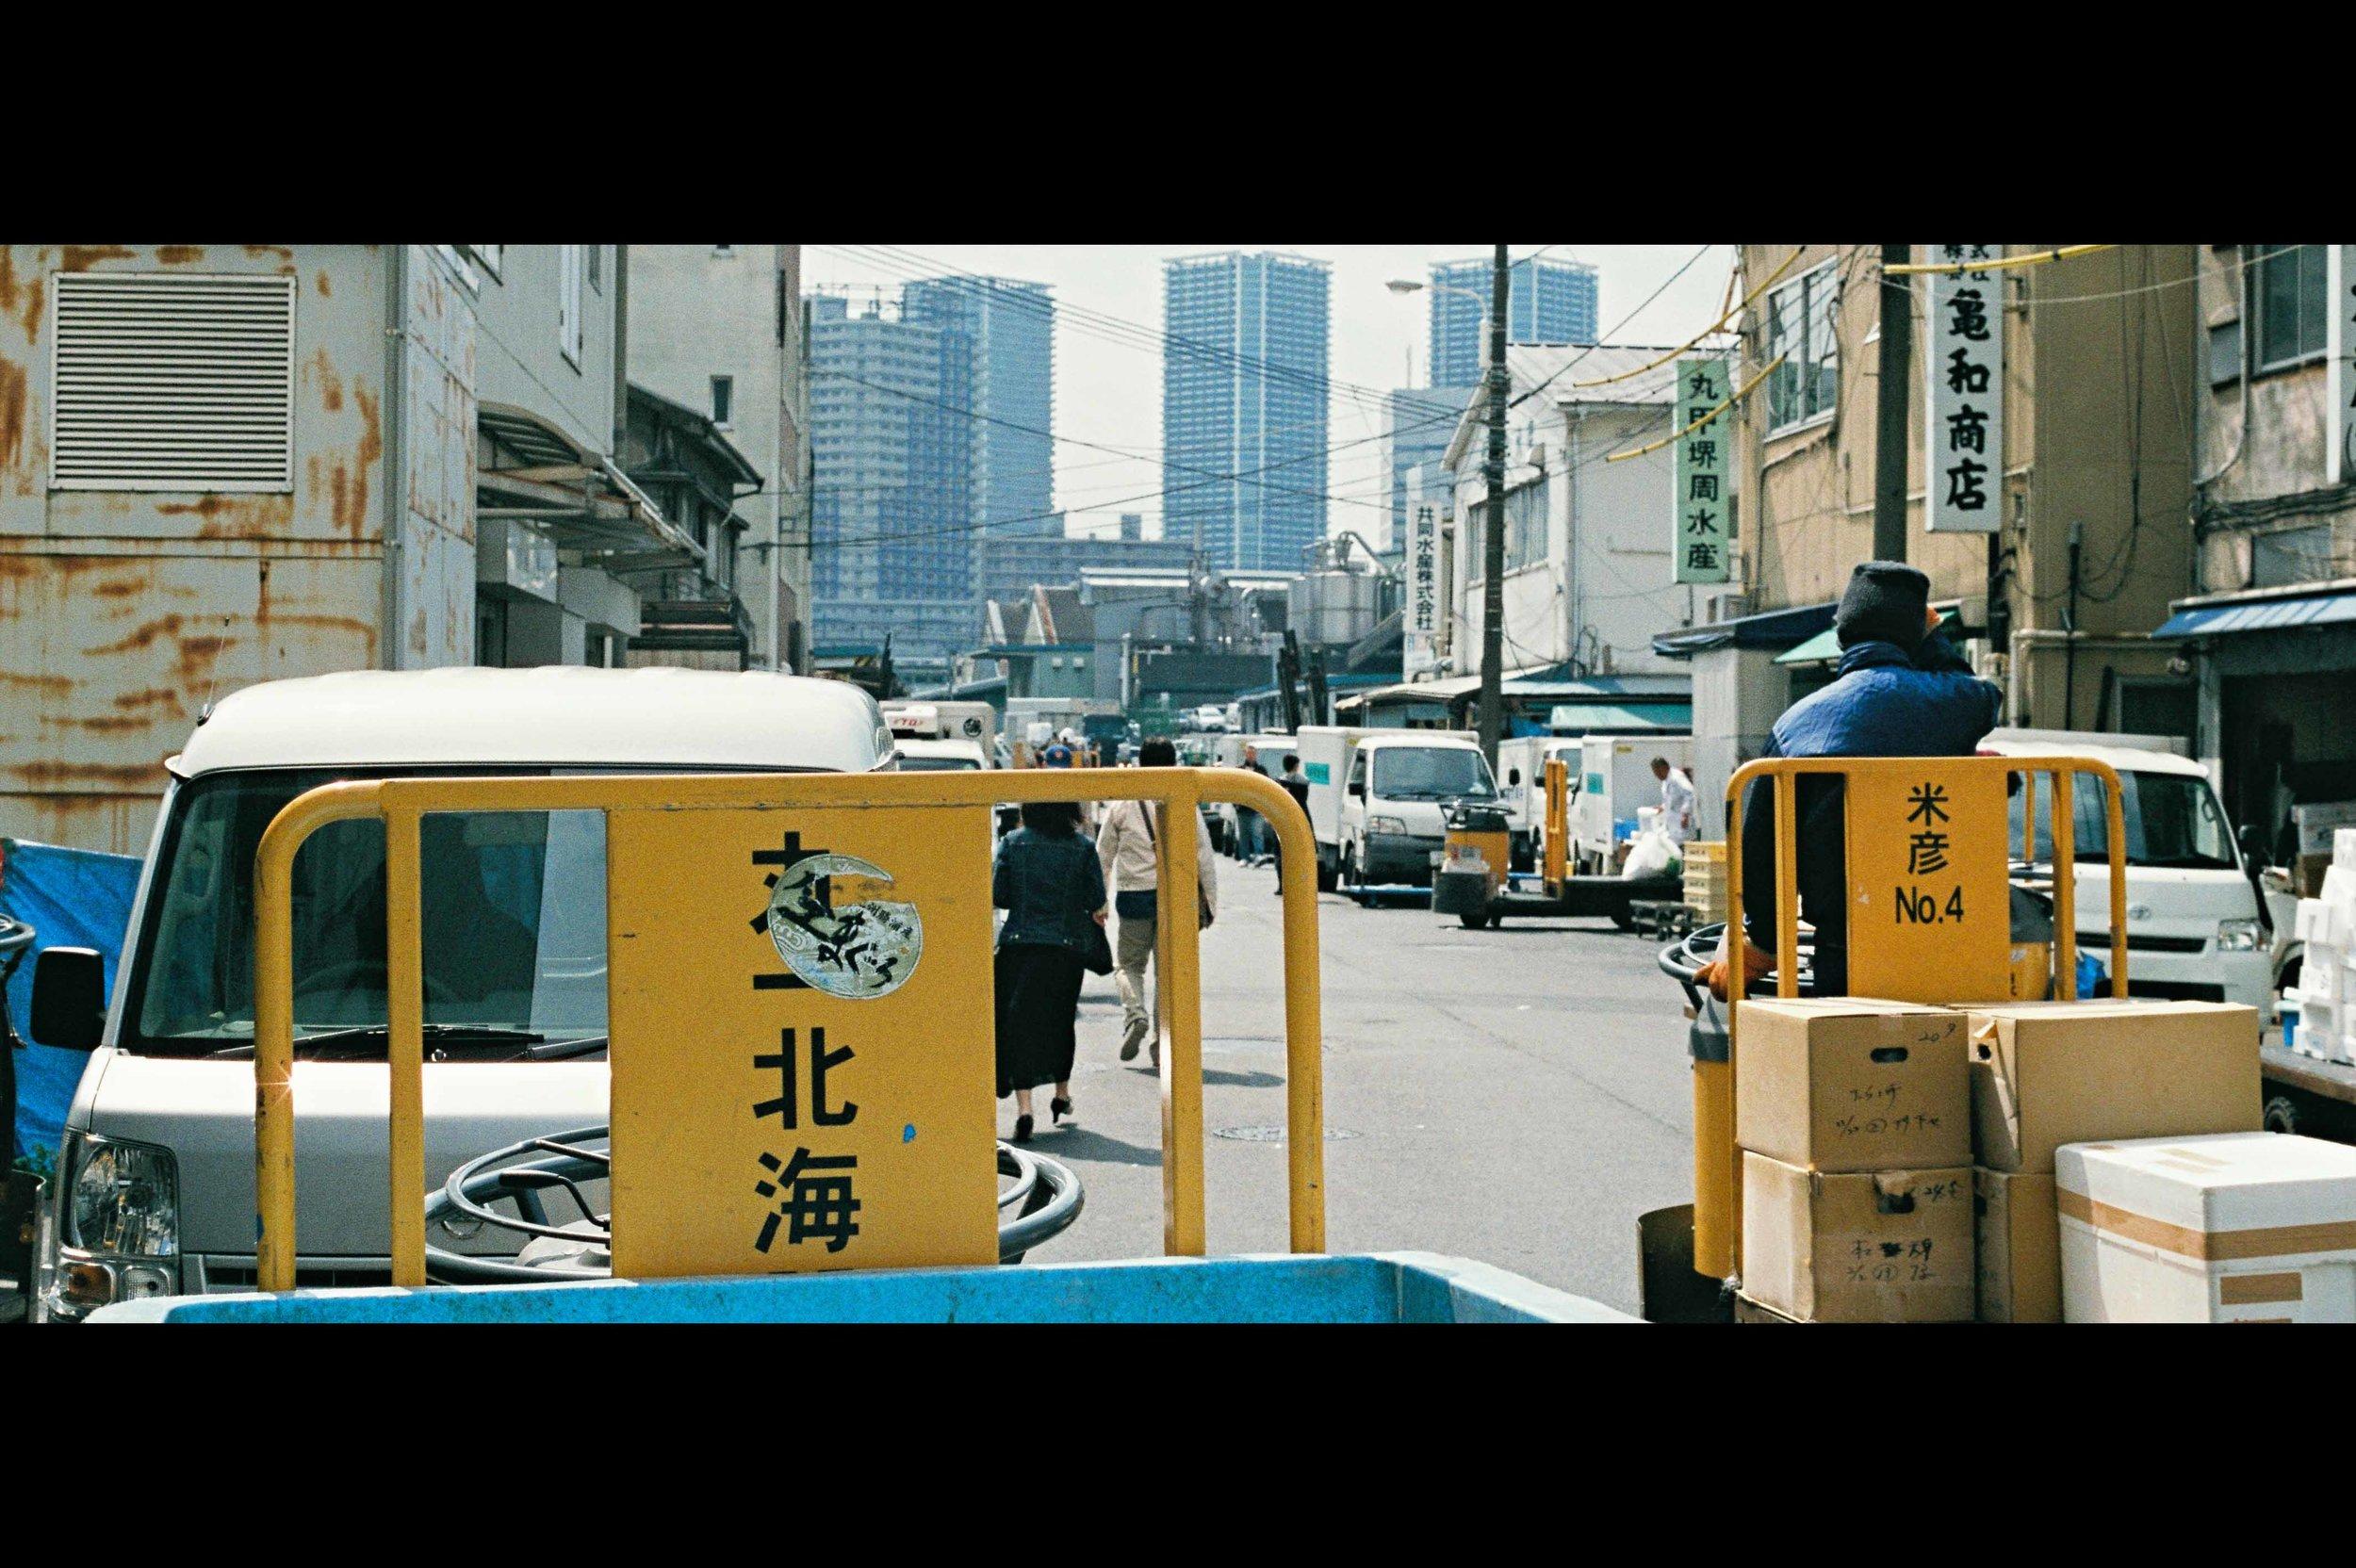 fish-market-vendor-cart-trolleypsd.jpg